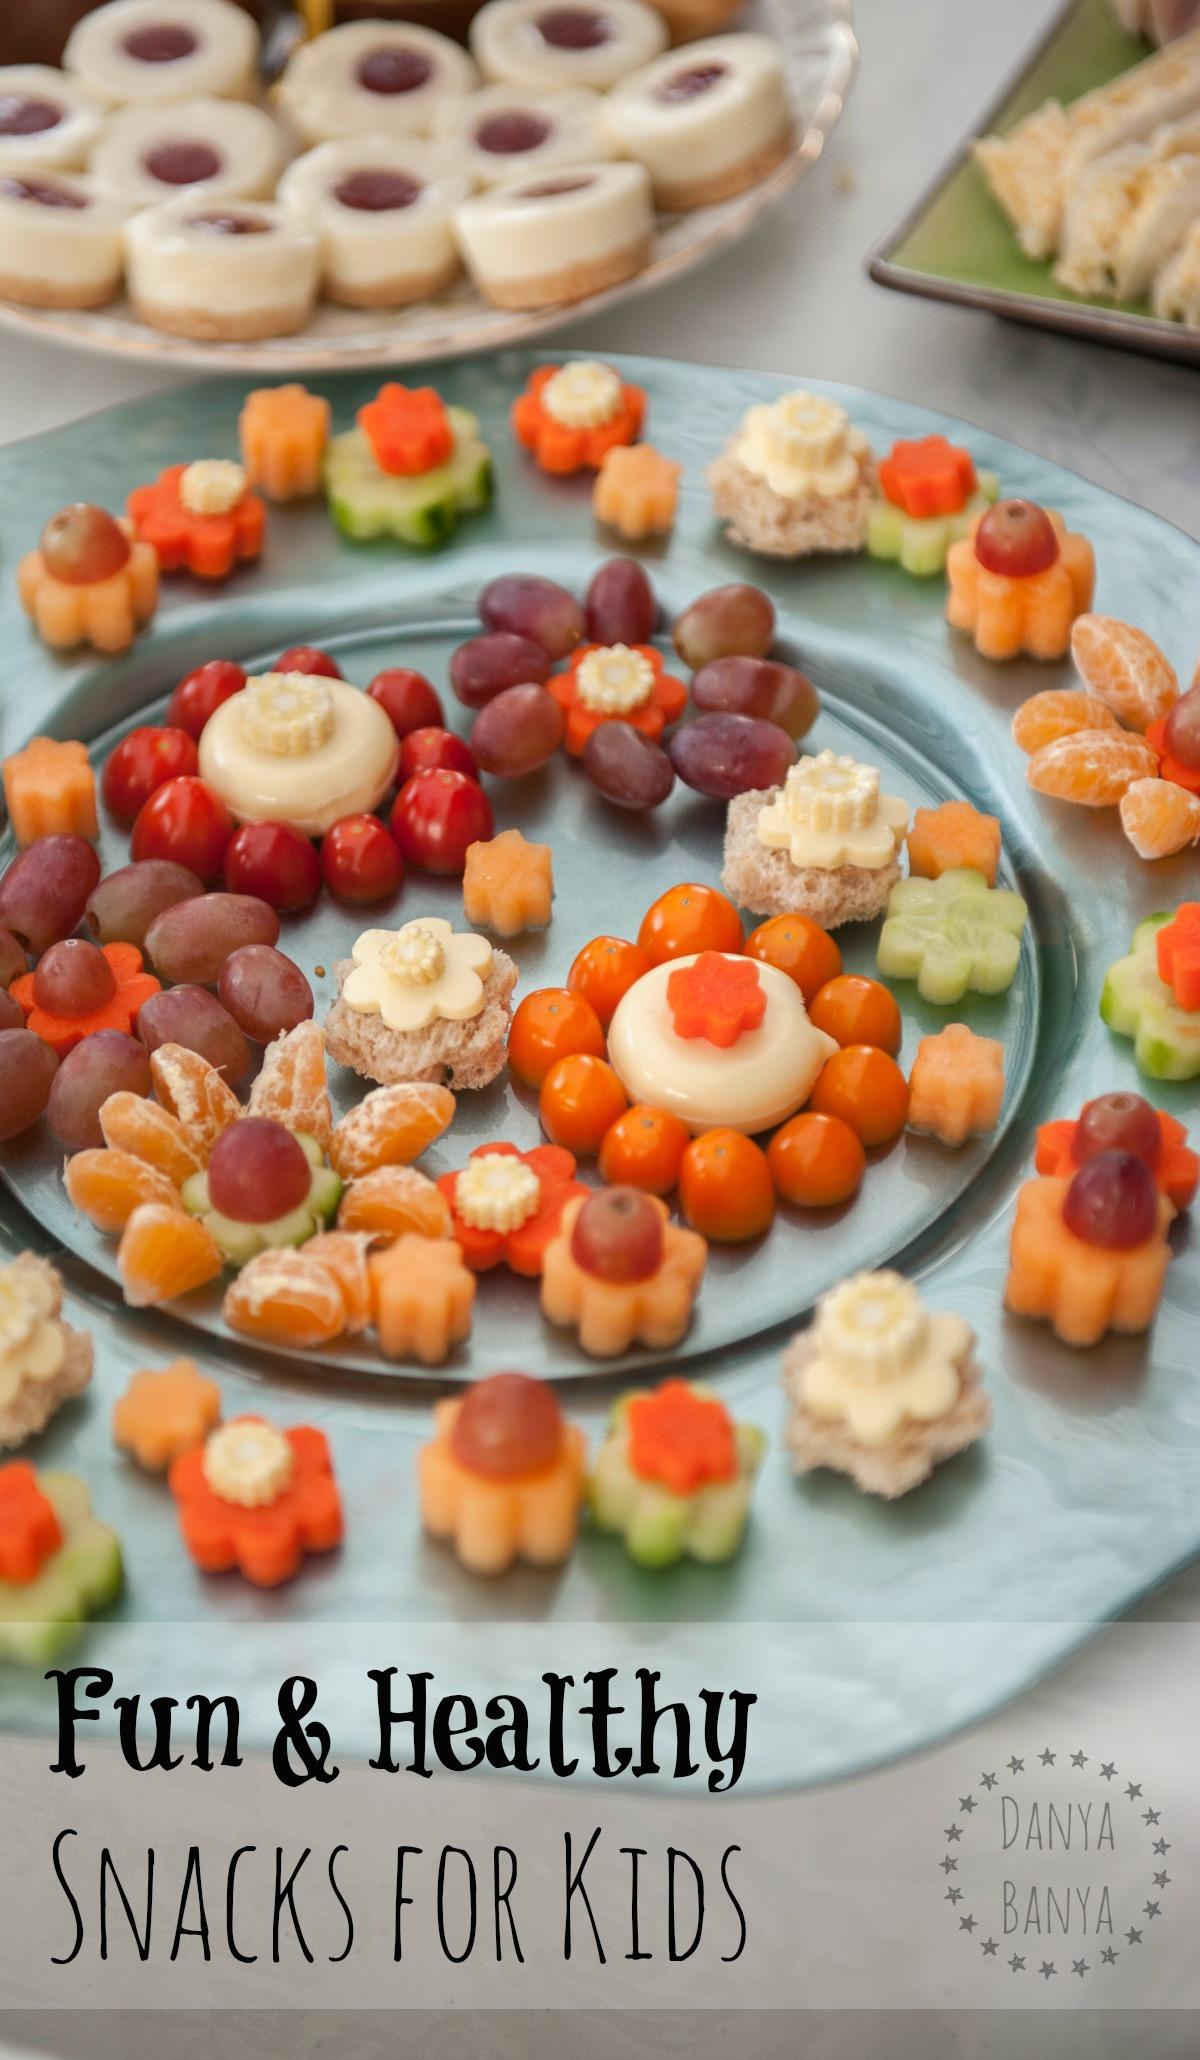 Healthy Homemade Snacks For Kids  Fun & Healthy Snacks for Kids – Danya Banya